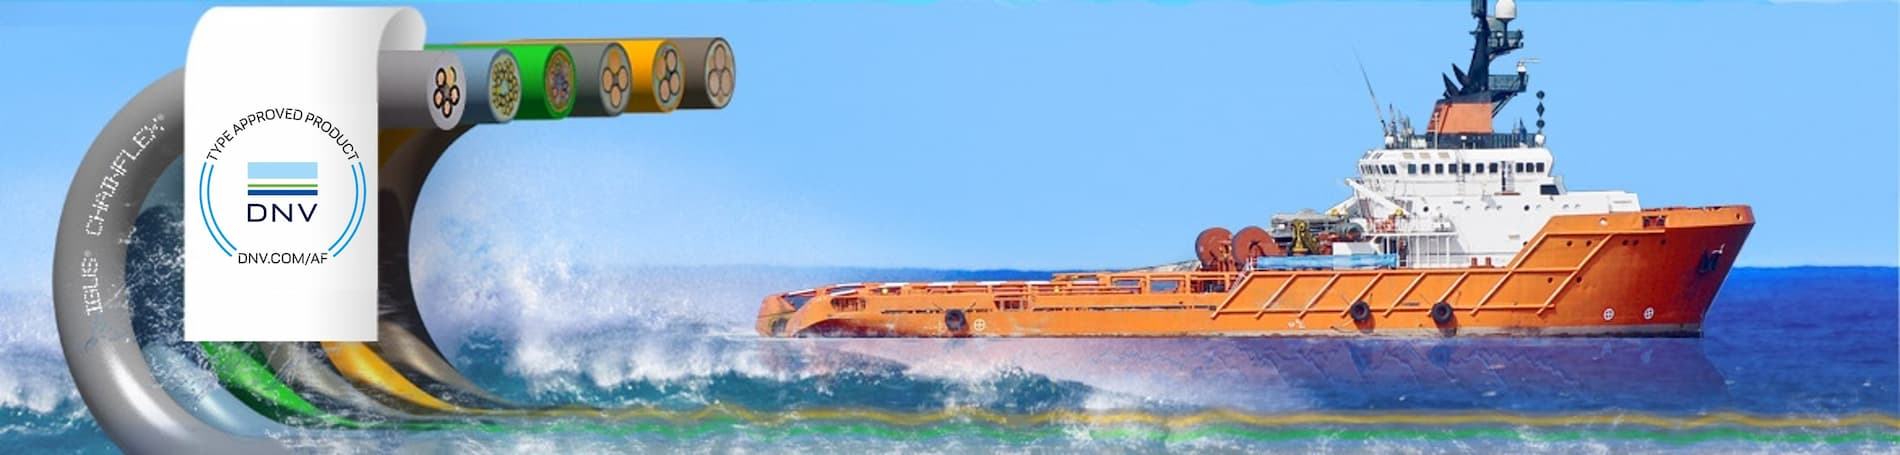 cable marino igus